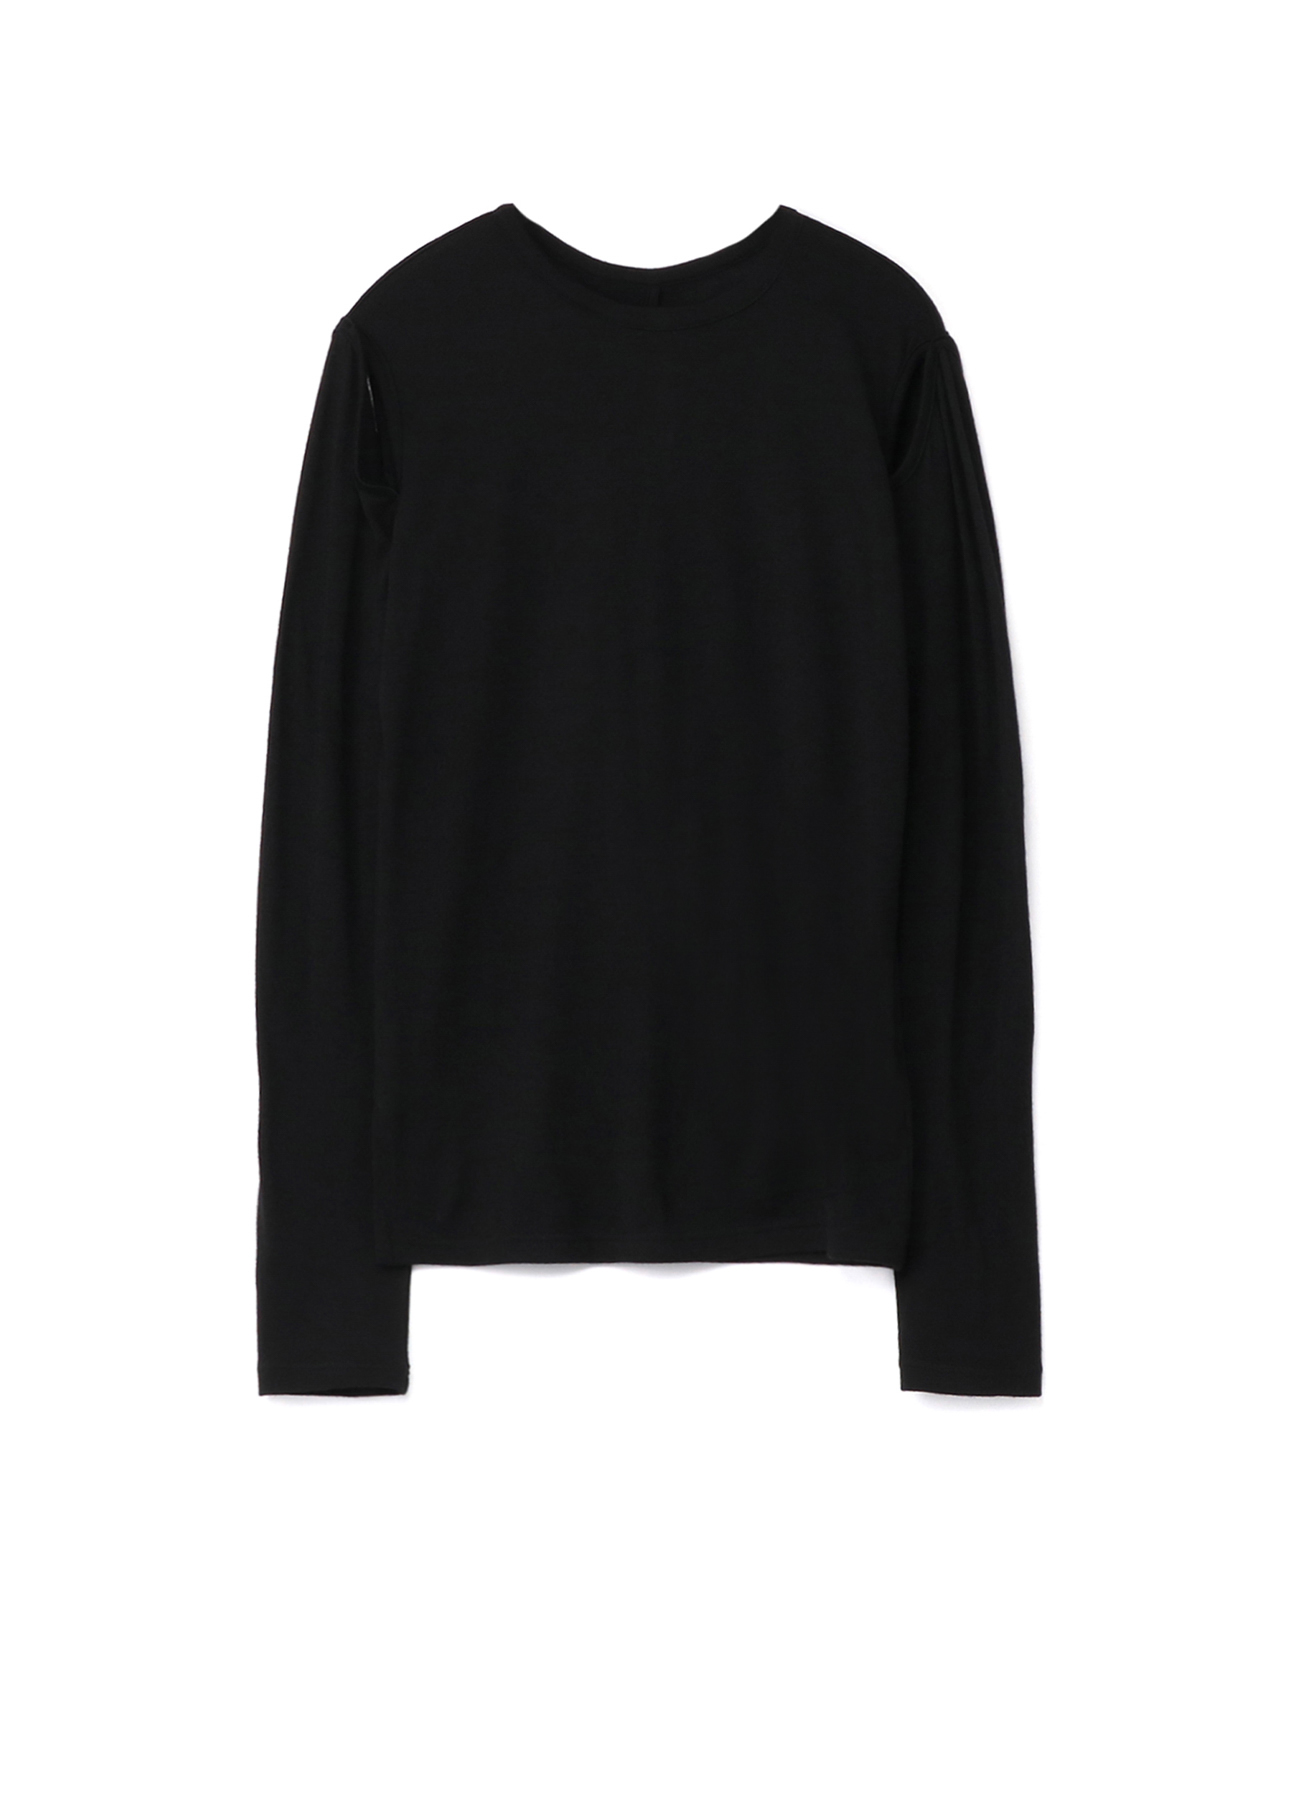 2/60 Wool Plain stitch Sleeve Slit T-Shirt B